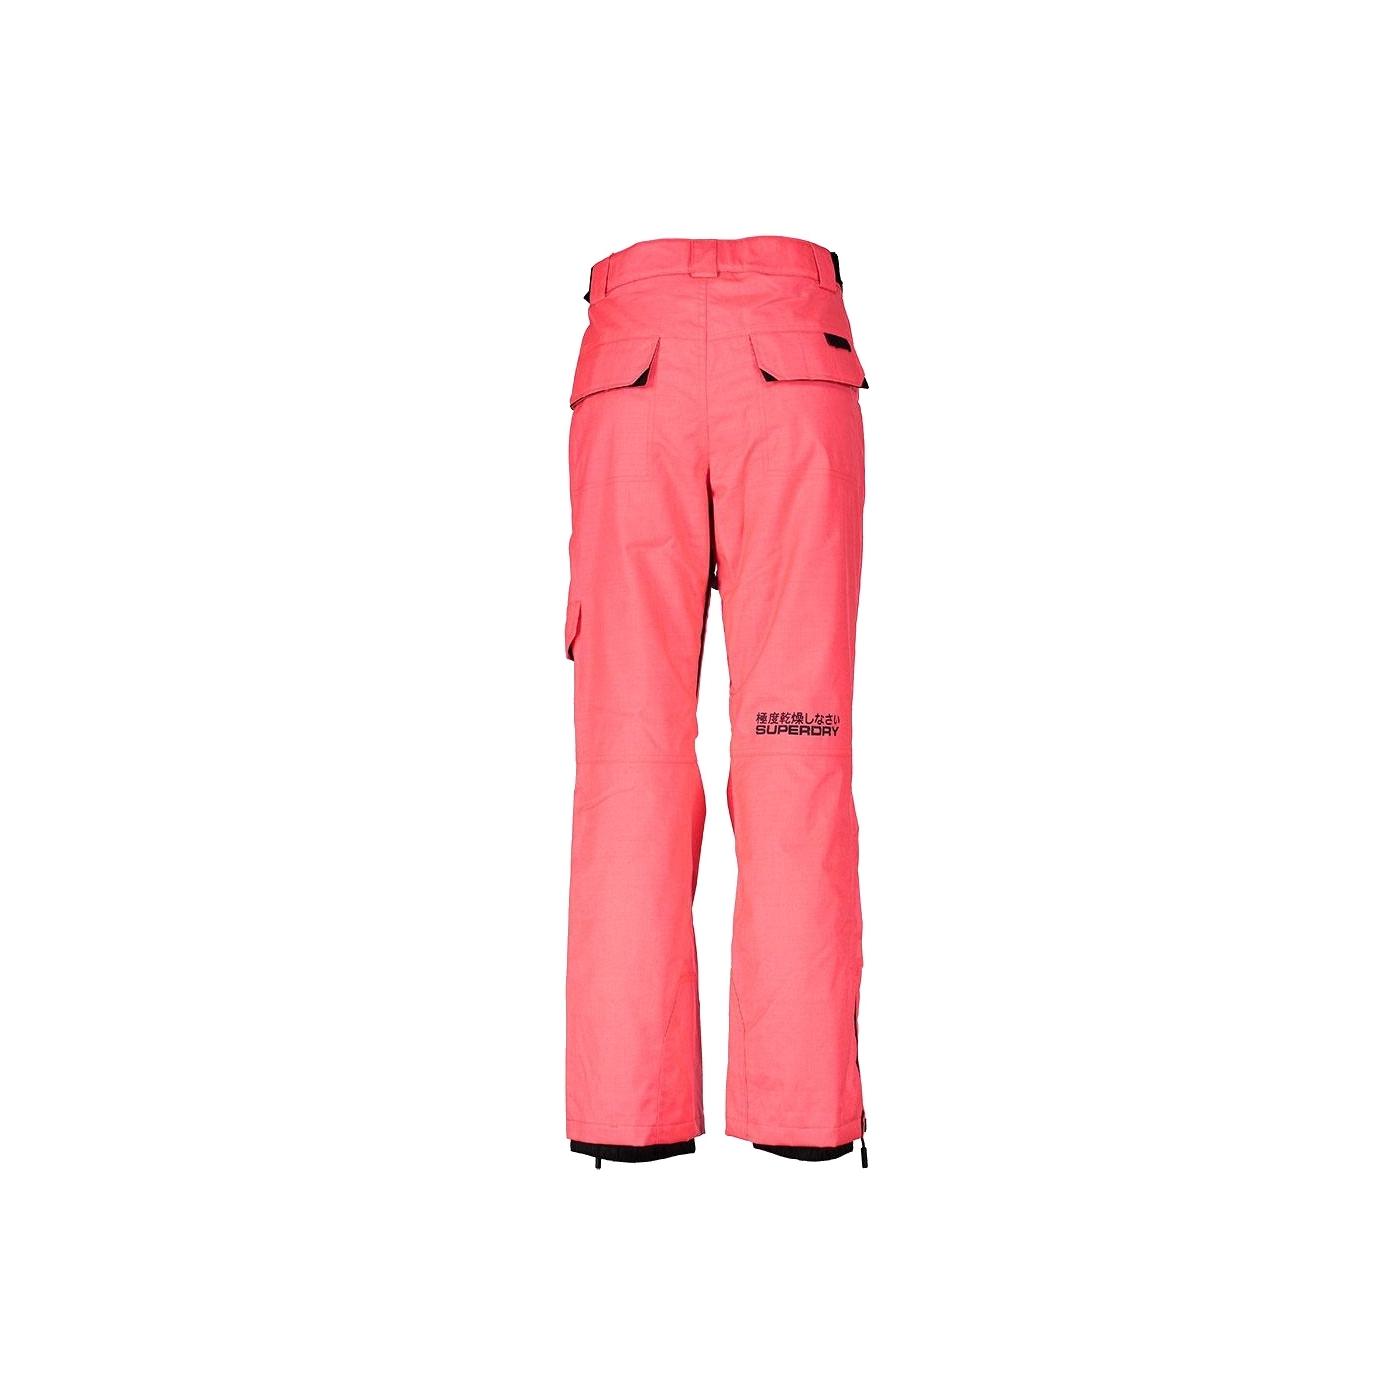 4cc29bdbdd Pantalon De Ski Superdry Snow Pant Fluro Coral